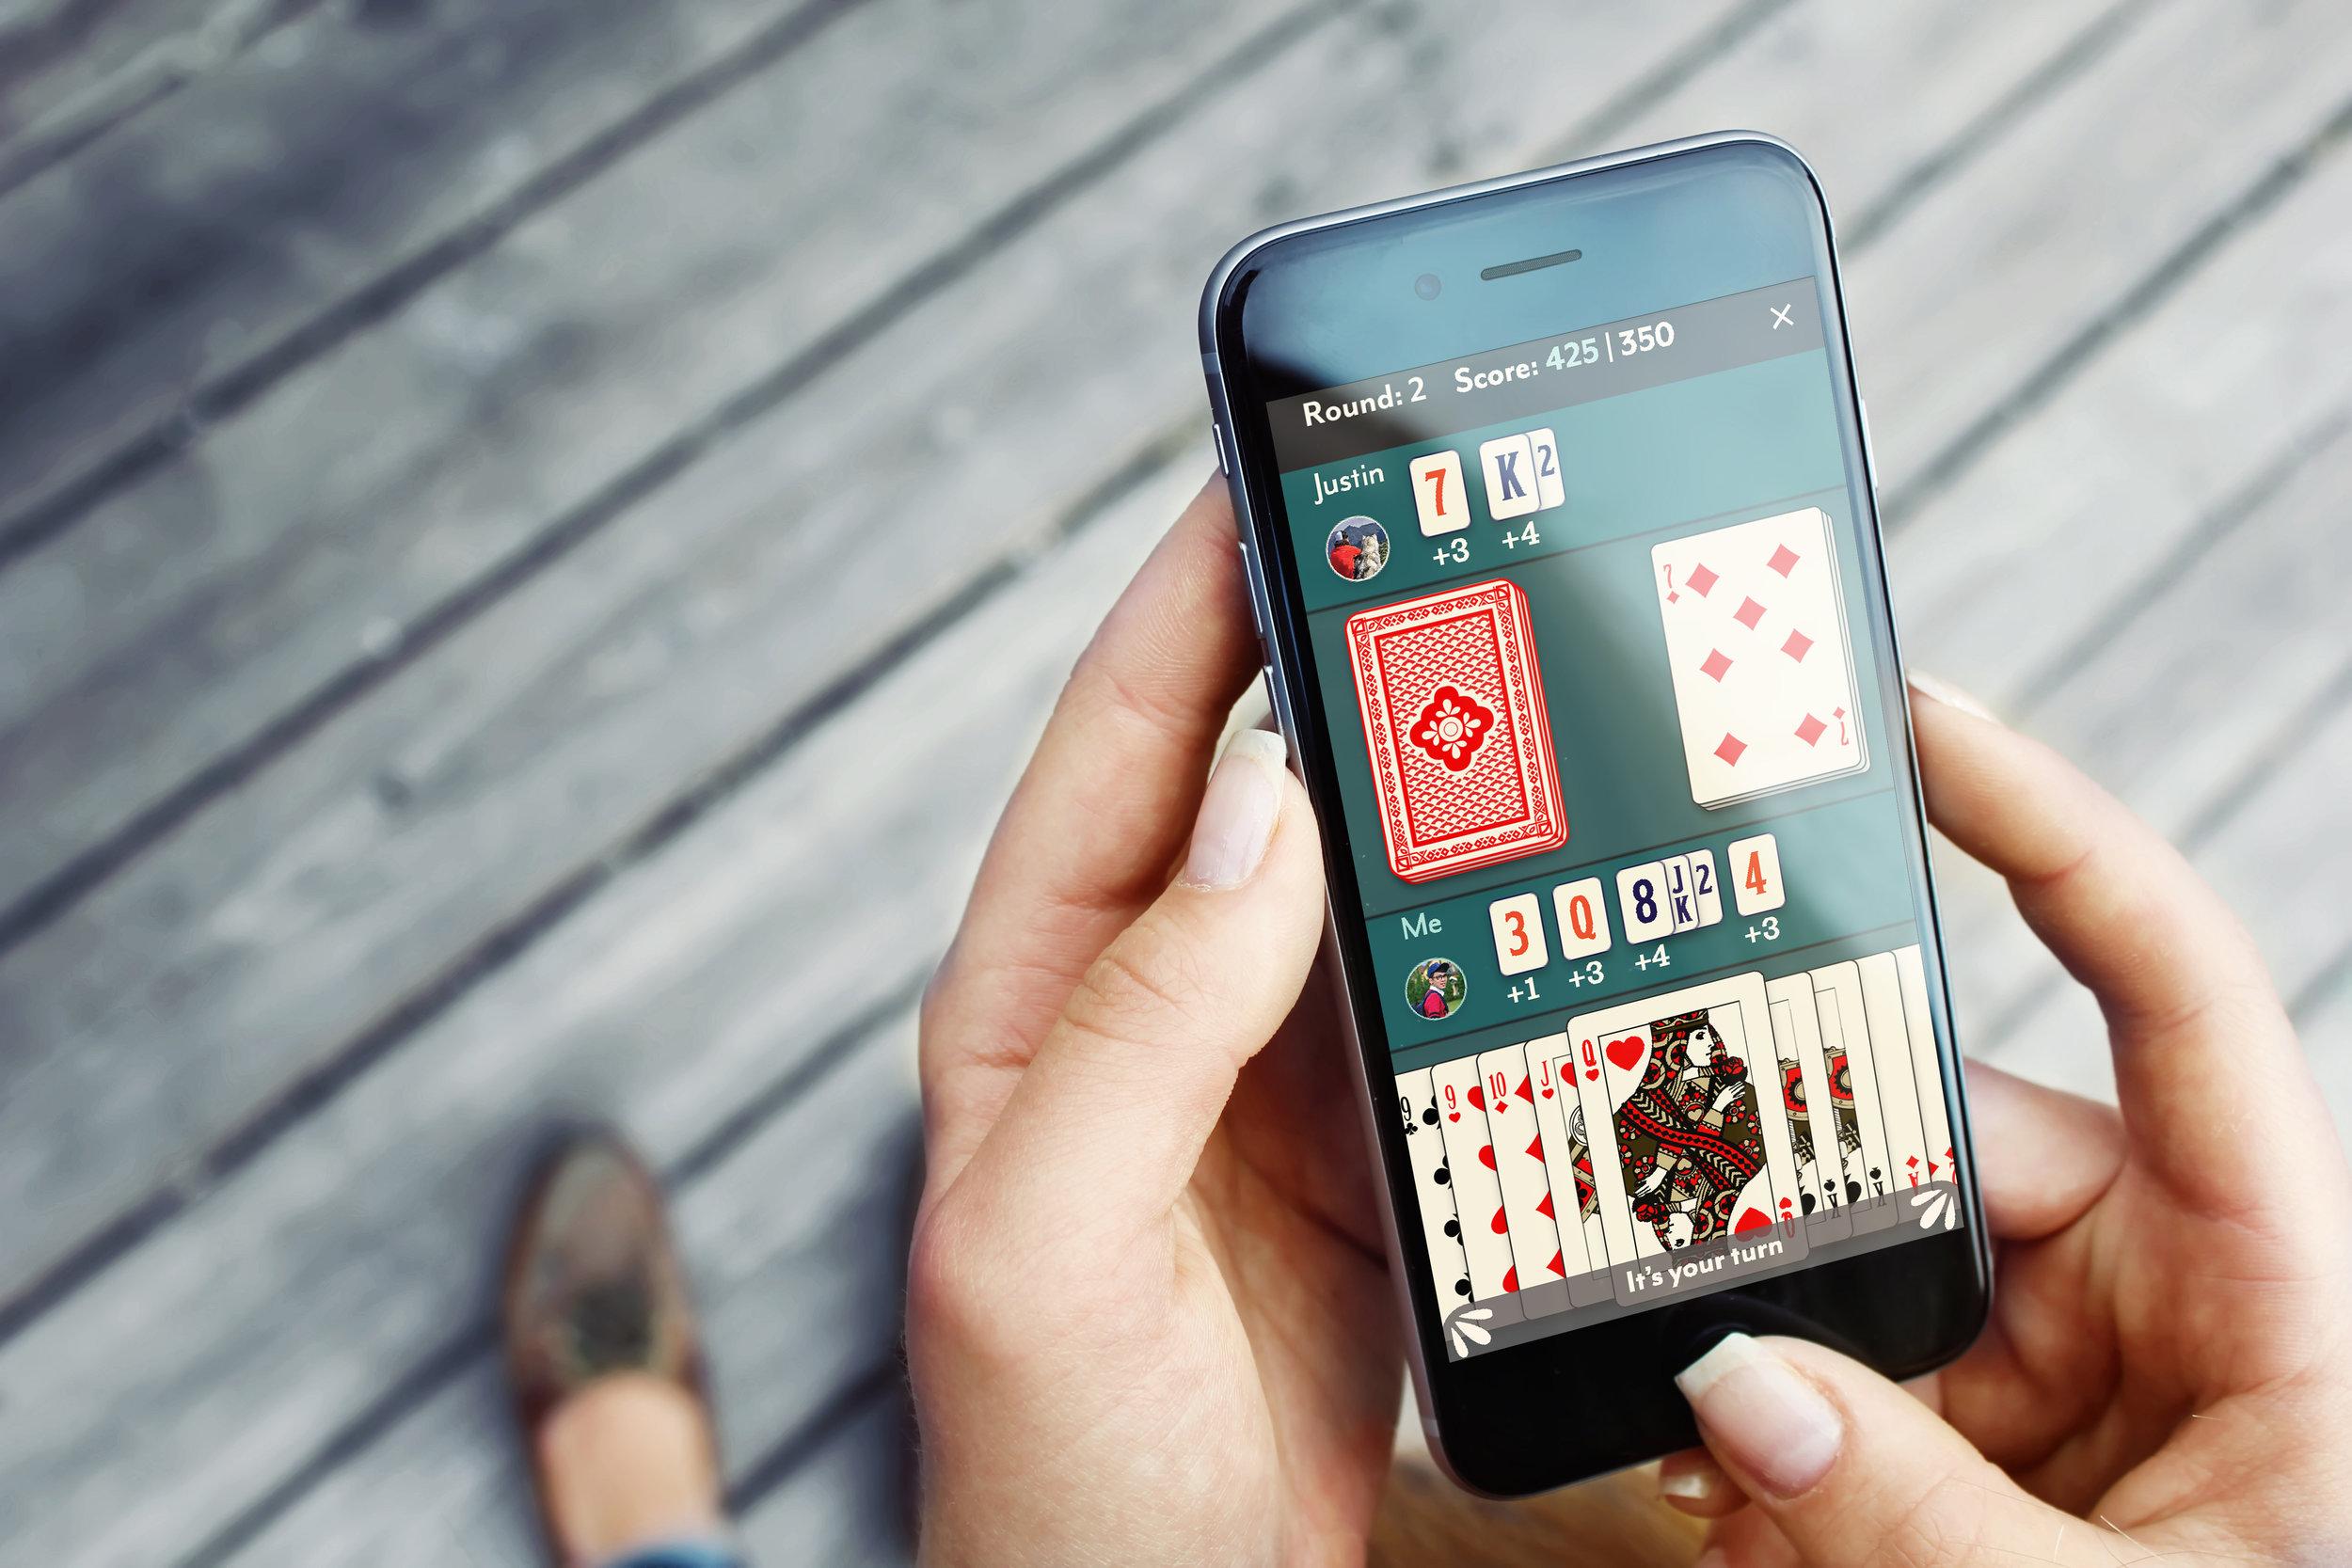 iphone_deck_gameplayscreen_rgb1.jpg